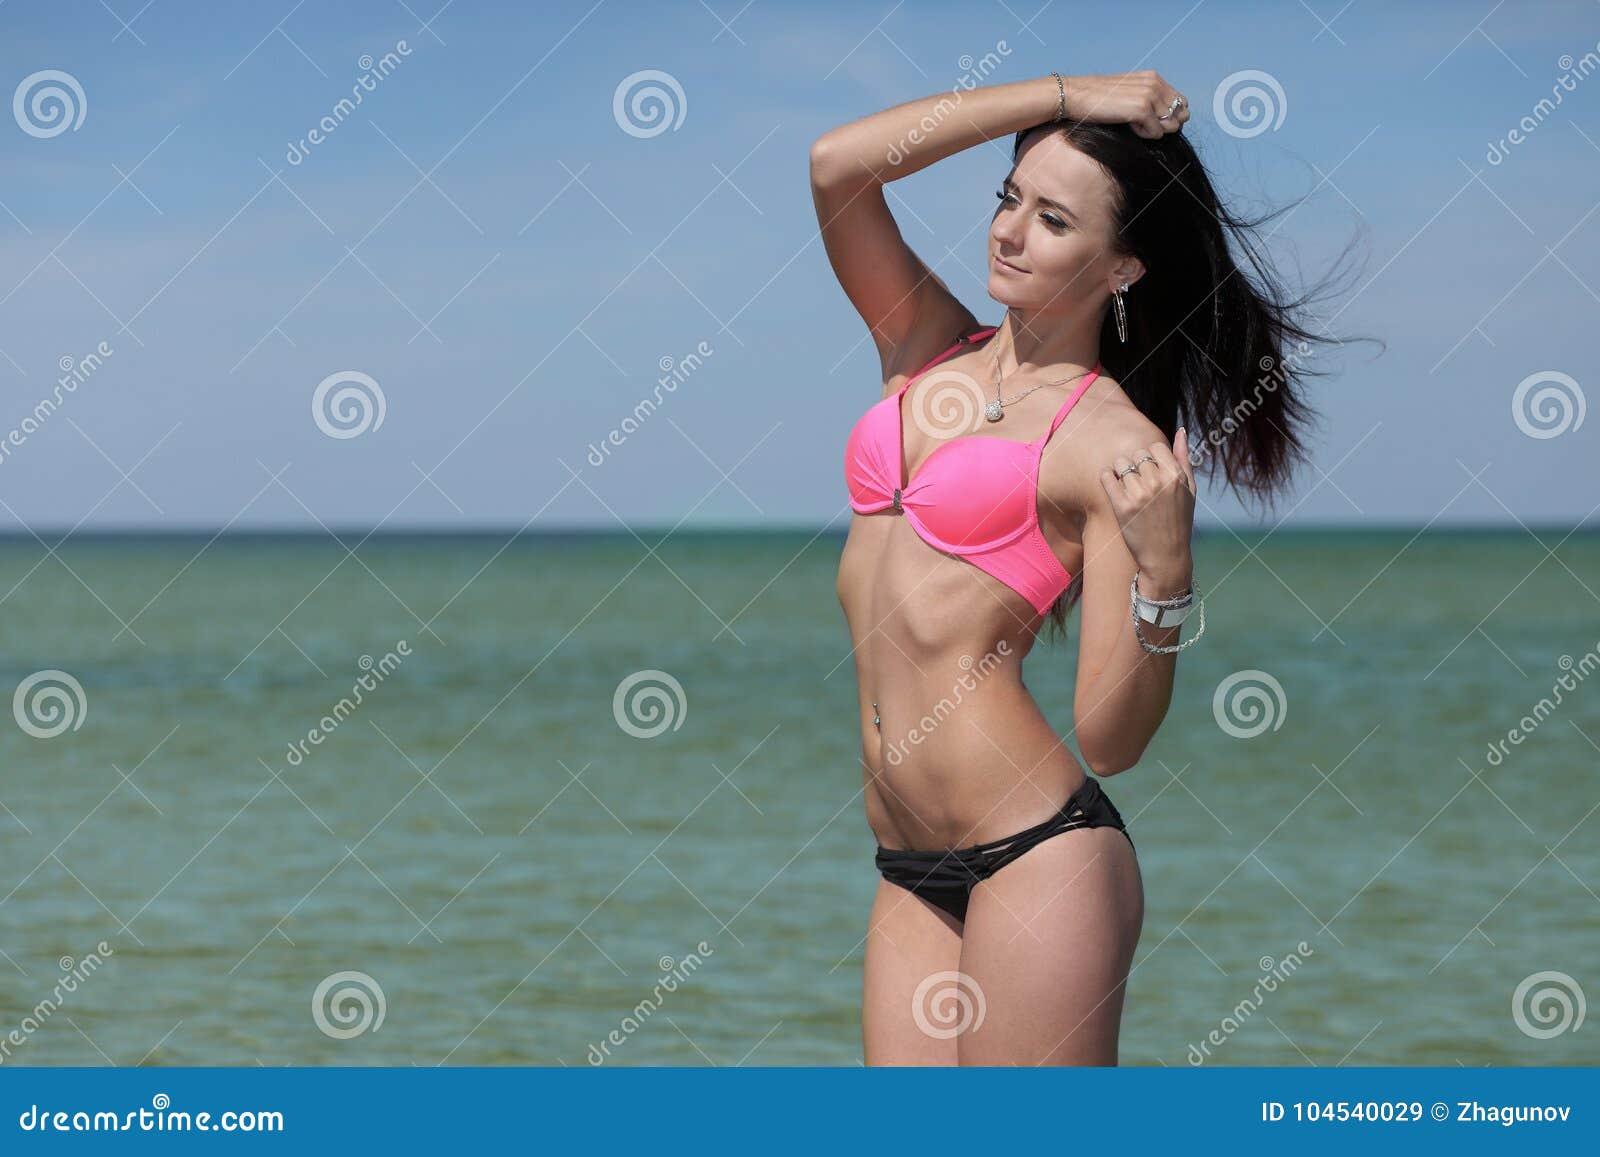 Девчонка в купальнике картинки — pic 8